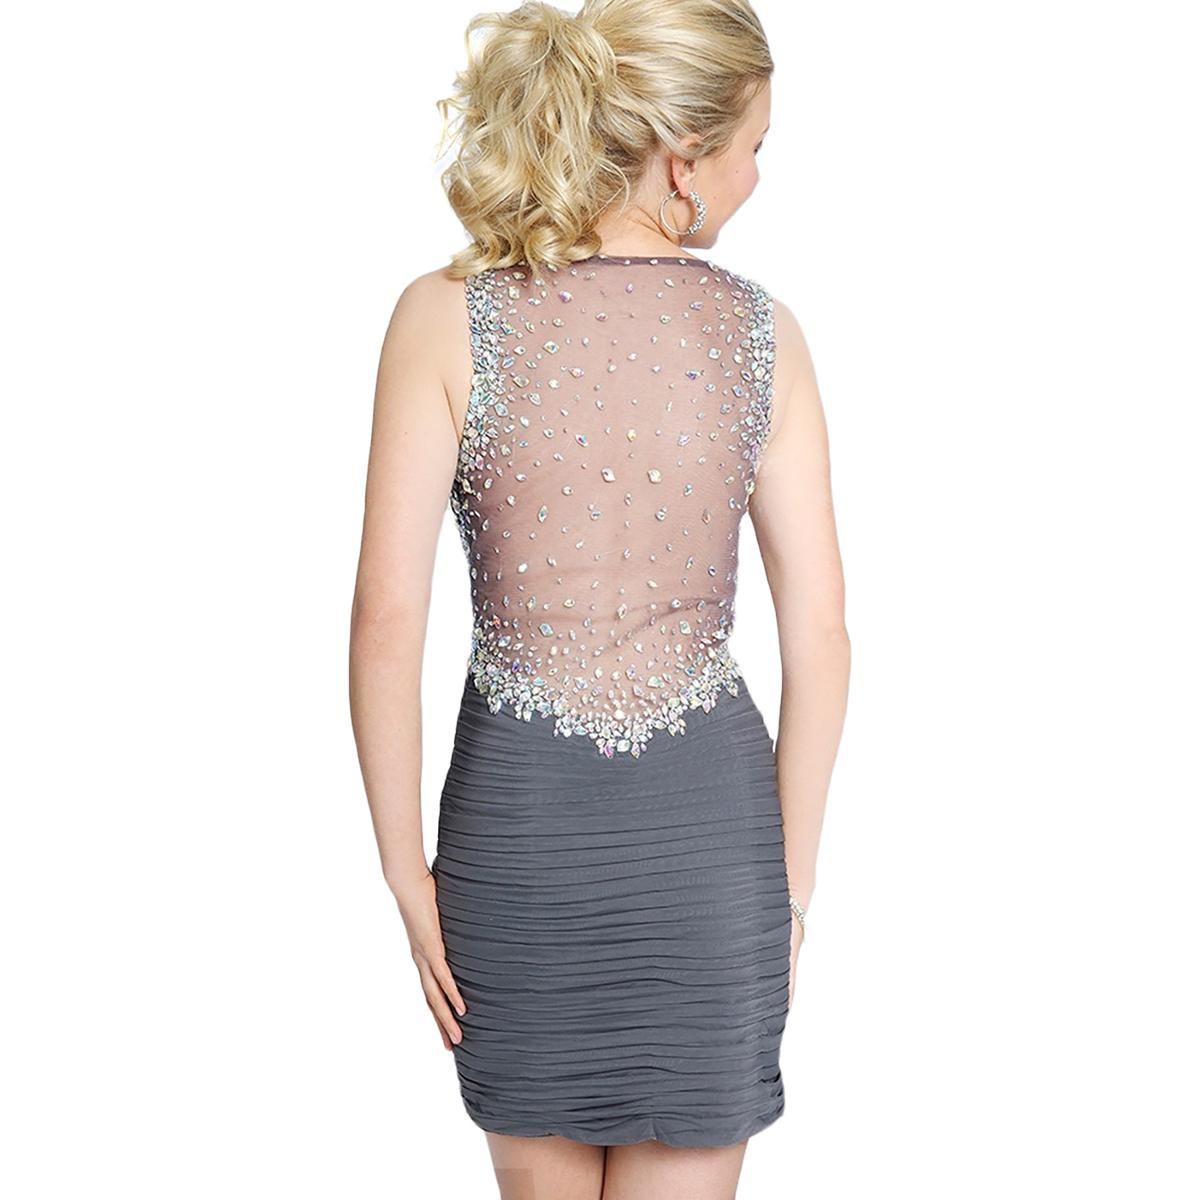 5d812128c8 JVN By Jovani - Gray Womens Embellished Pleated Semi-formal Dress - Lyst.  View fullscreen